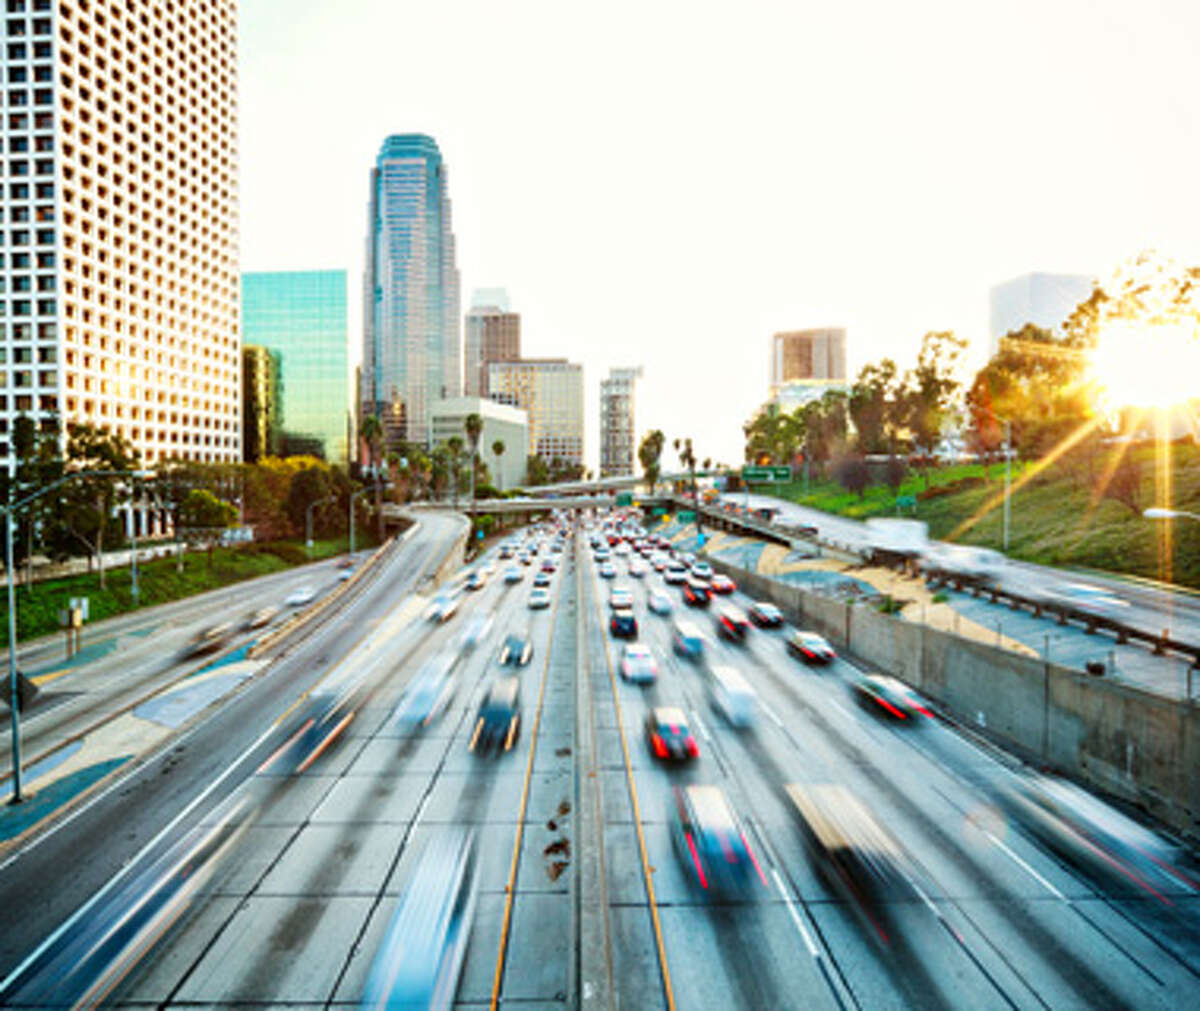 9. Los Angeles: 12 percent